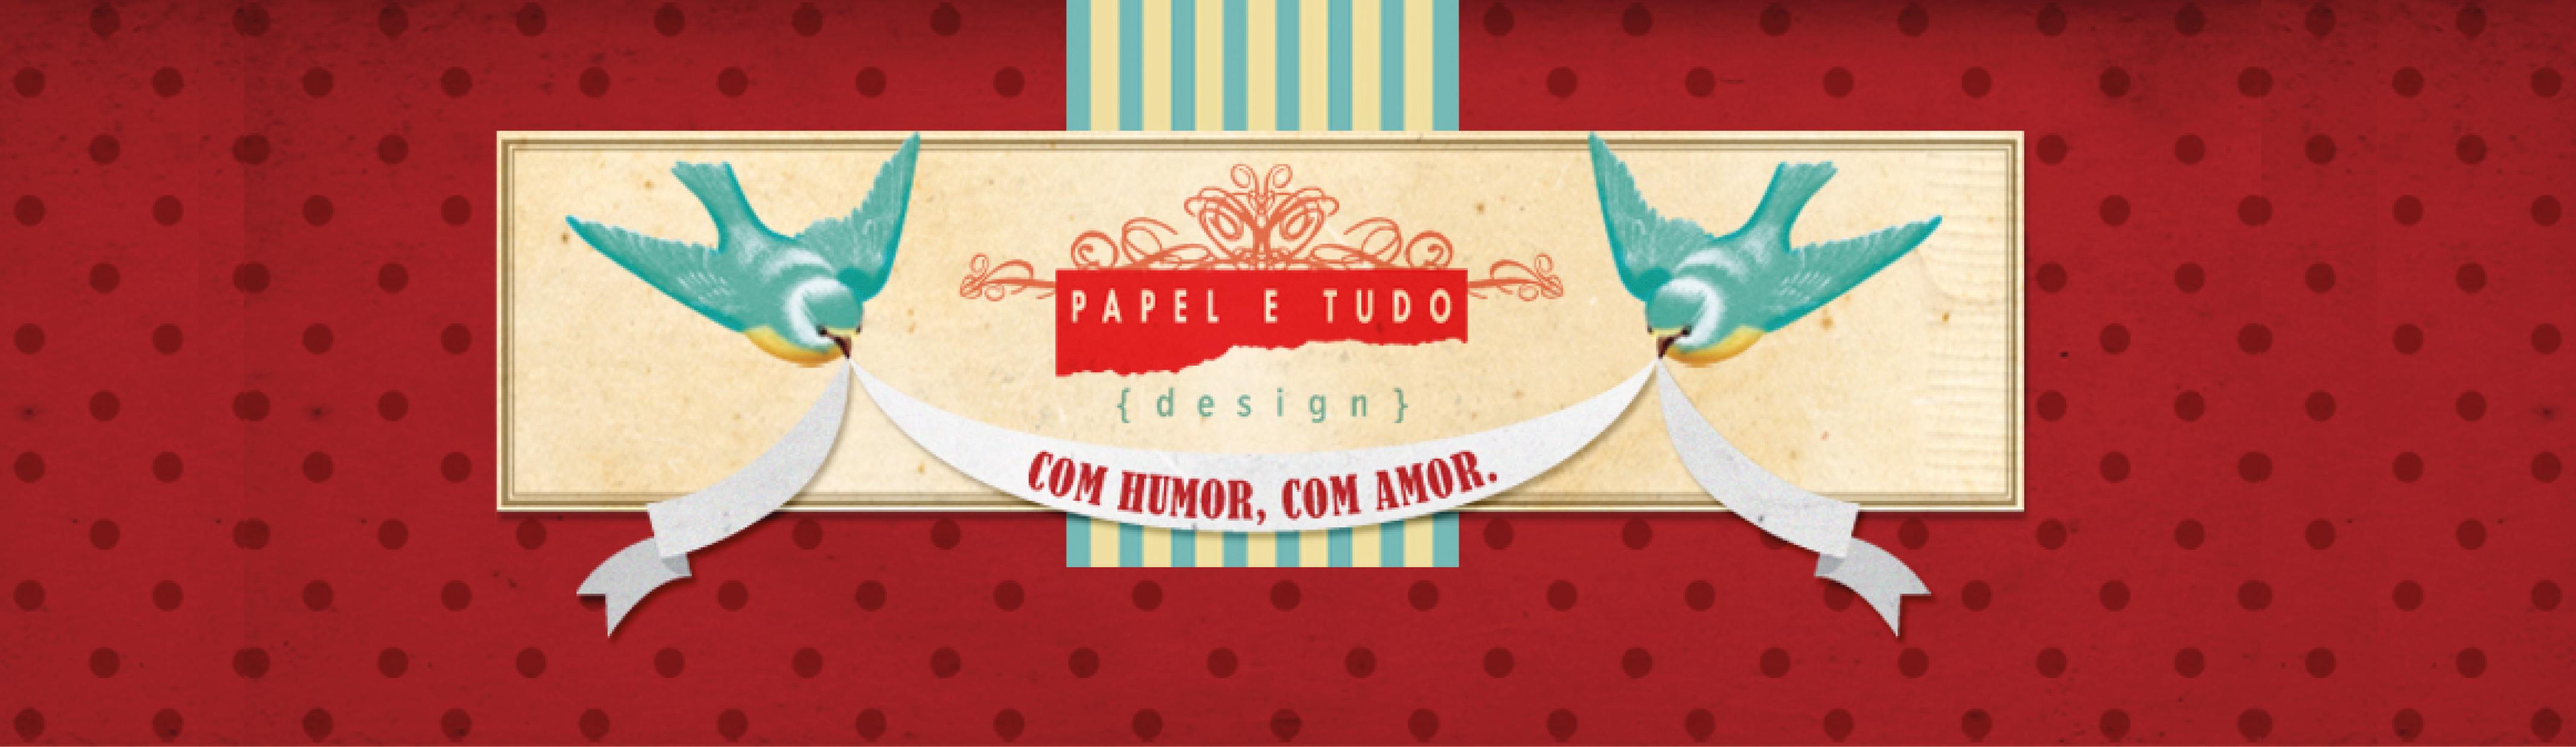 banner-sitecom-humor-com-amor-011